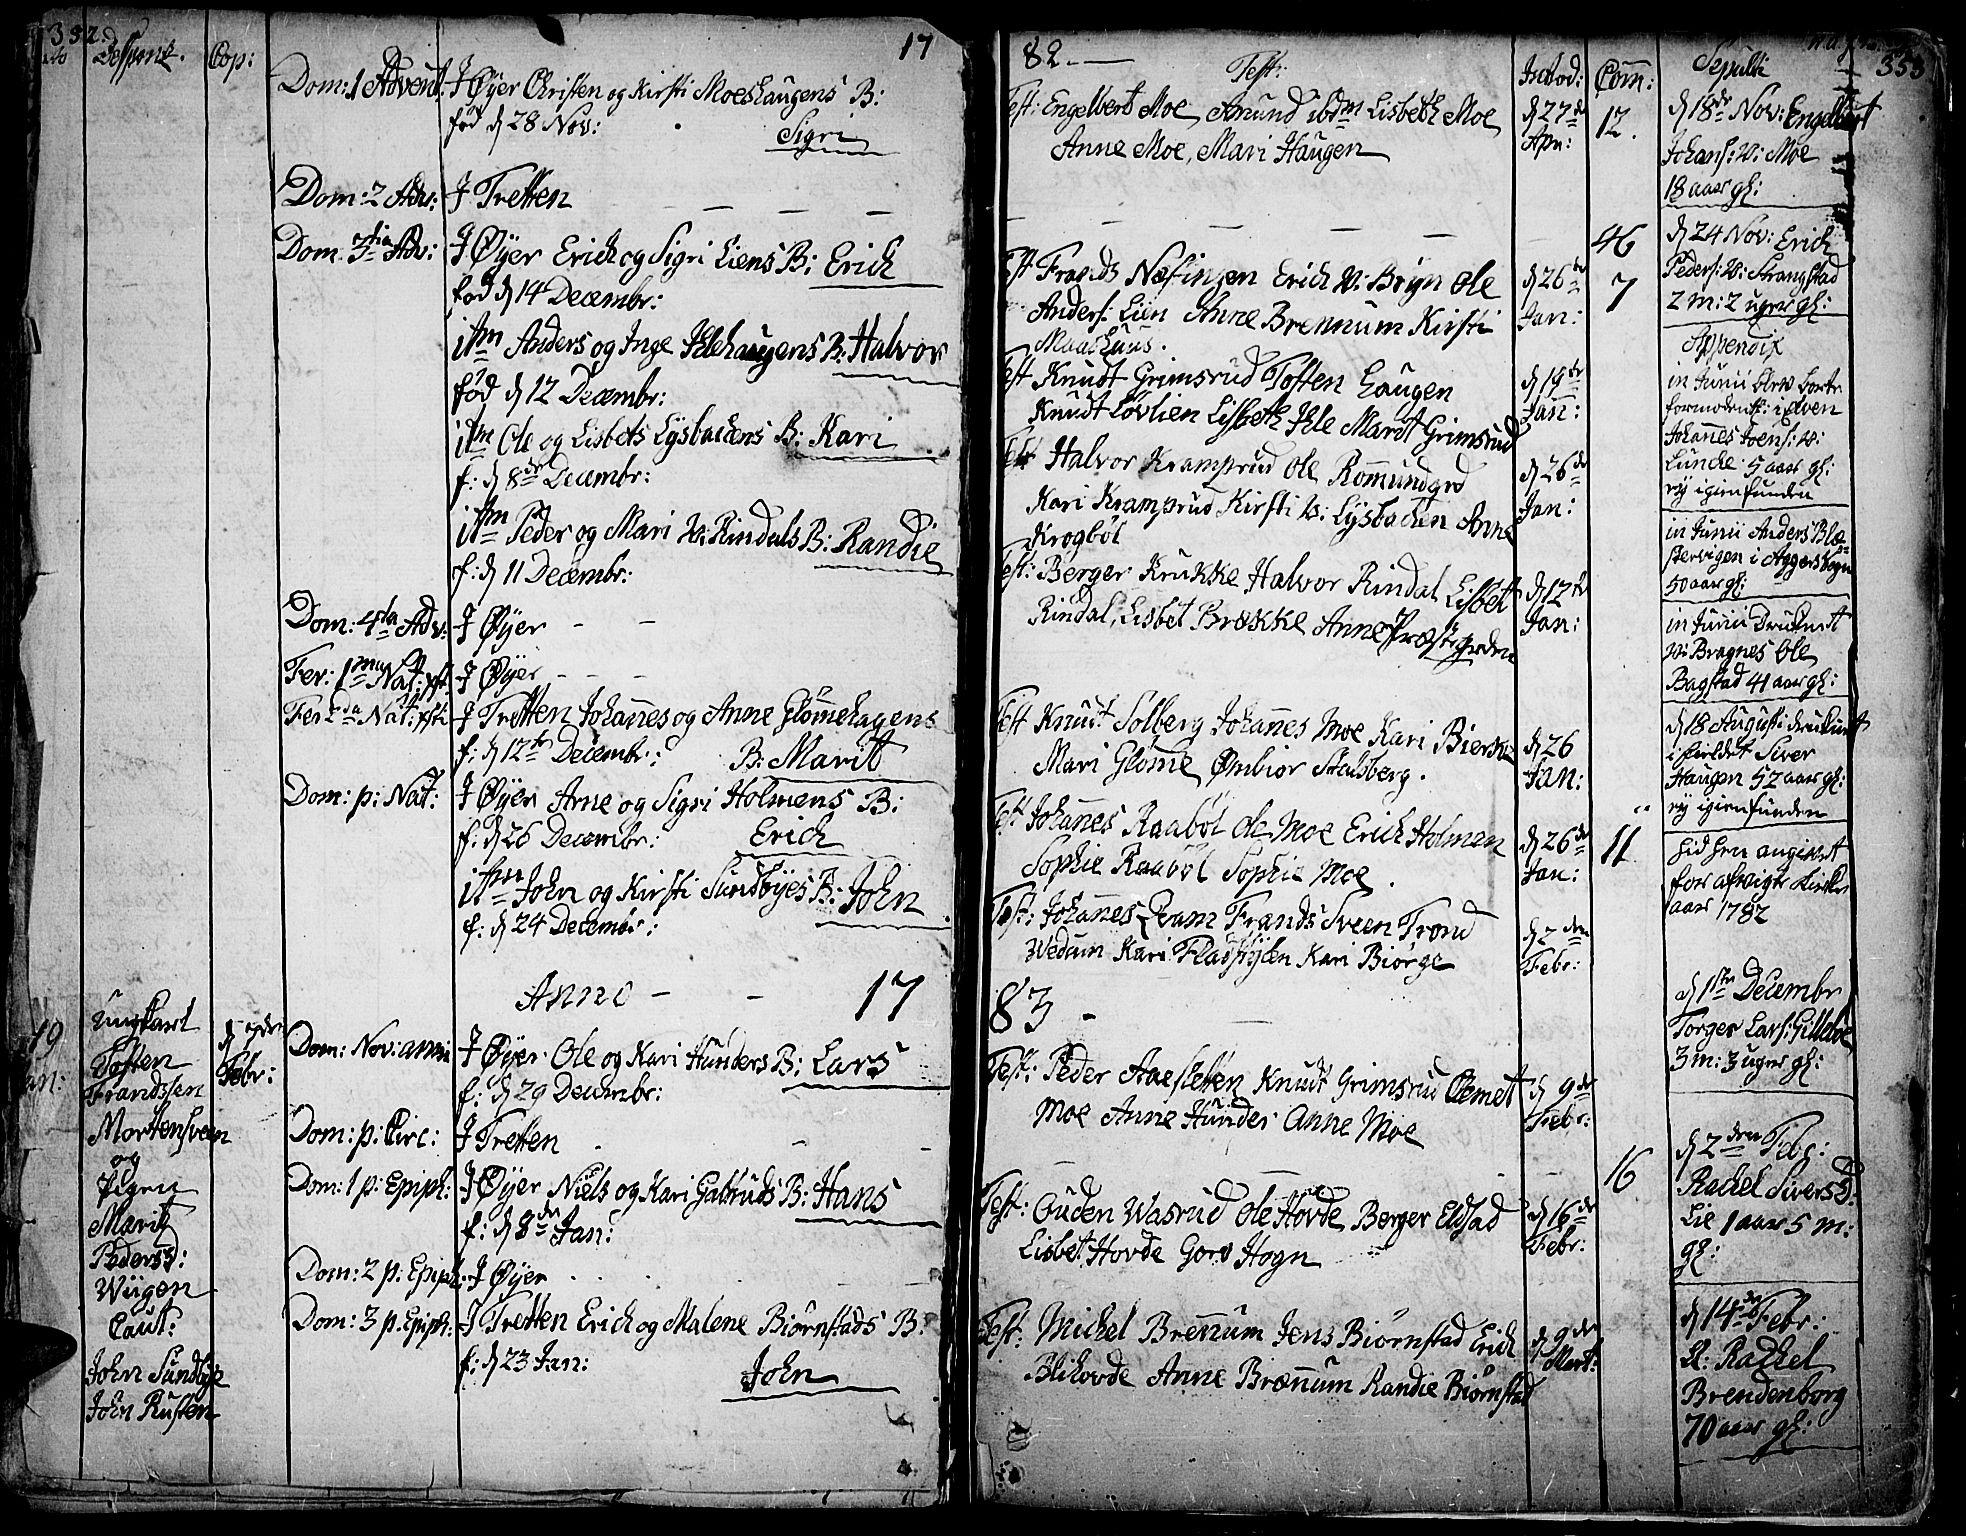 SAH, Øyer prestekontor, Ministerialbok nr. 2, 1733-1784, s. 352-353